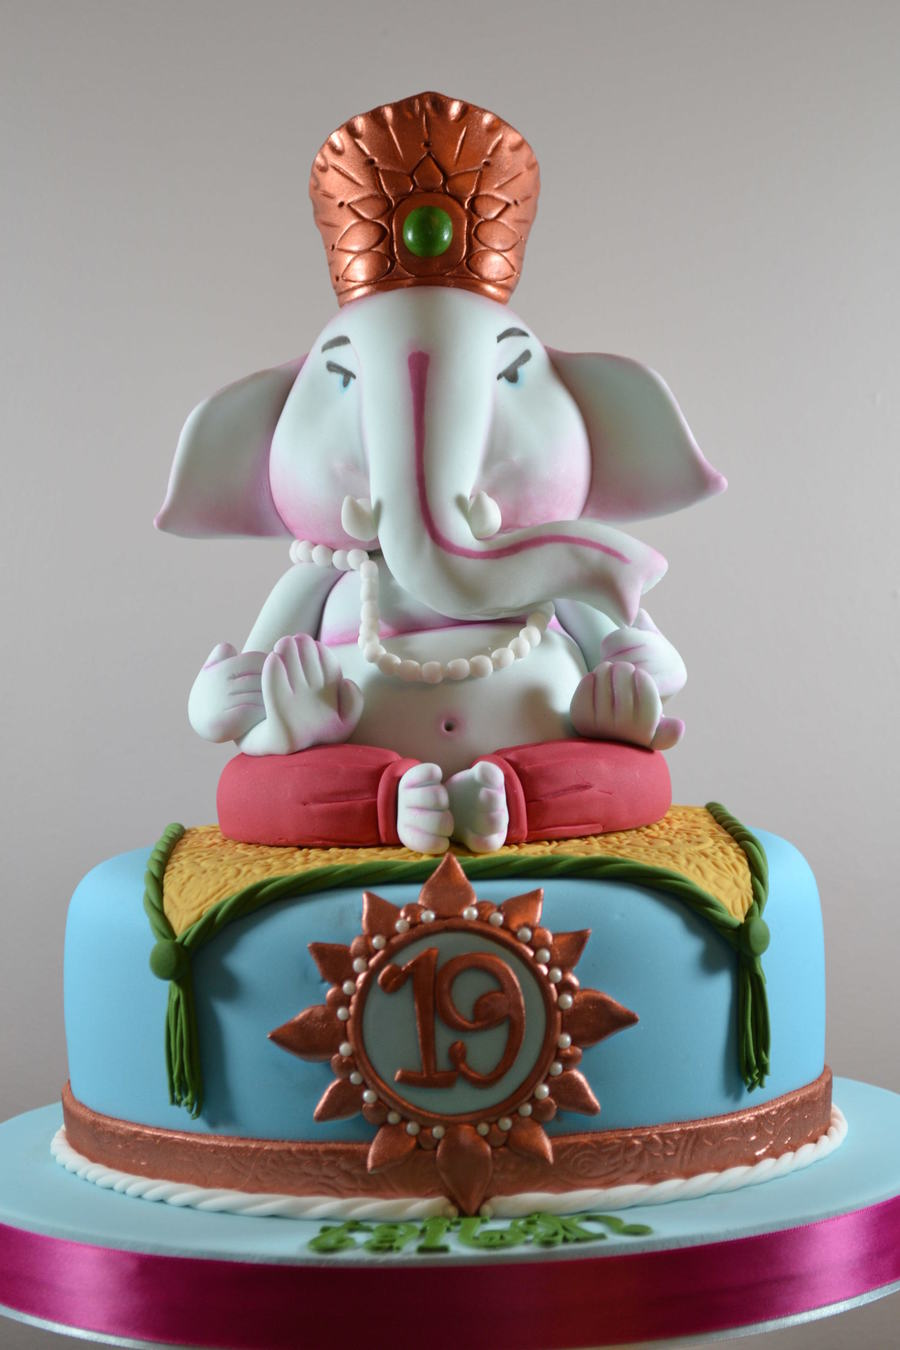 Ganesh Birthday Cake - CakeCentral.com